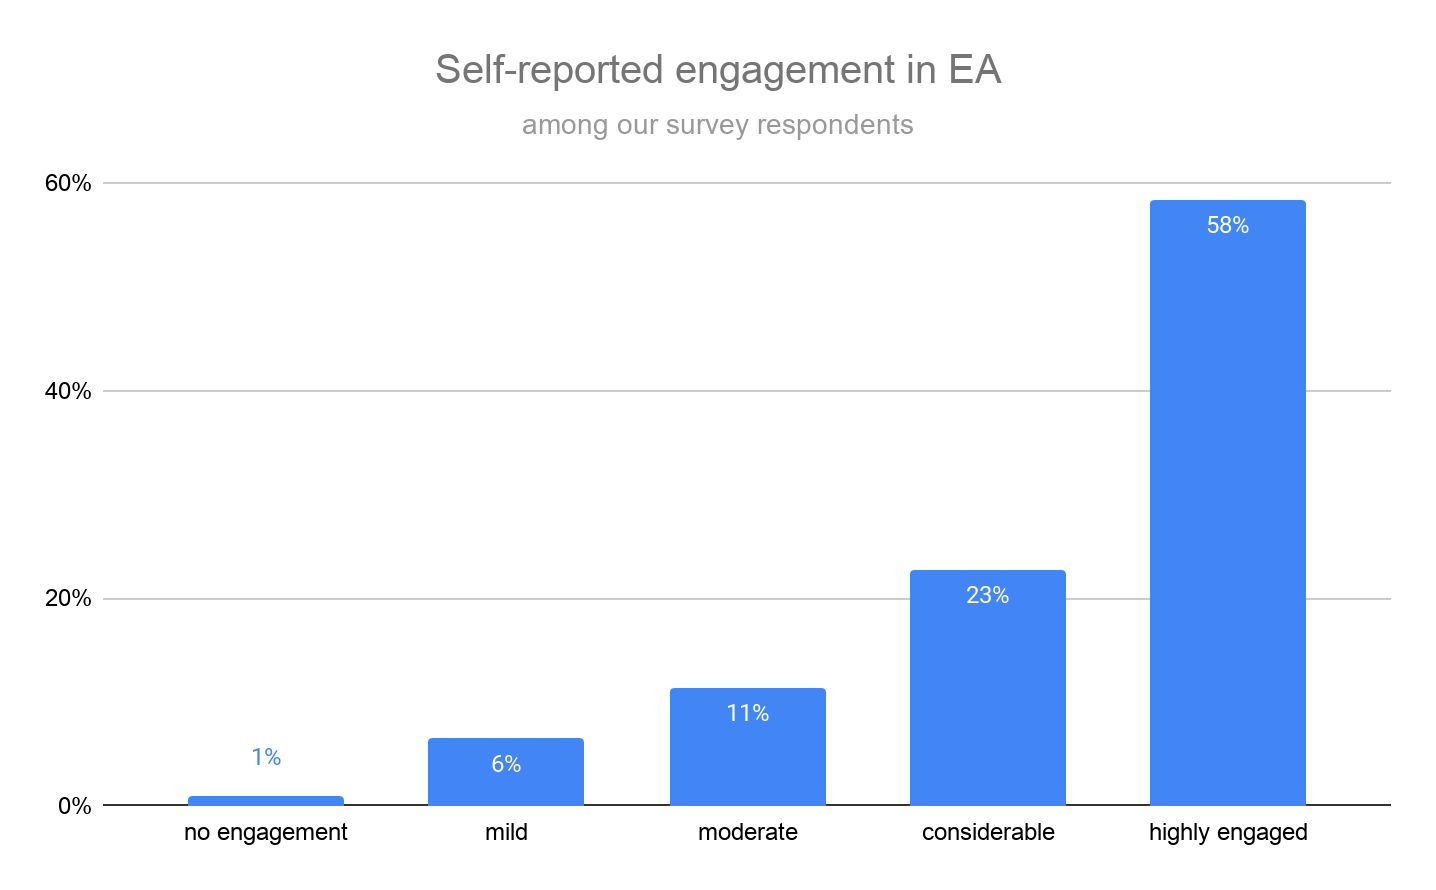 Engagement levels